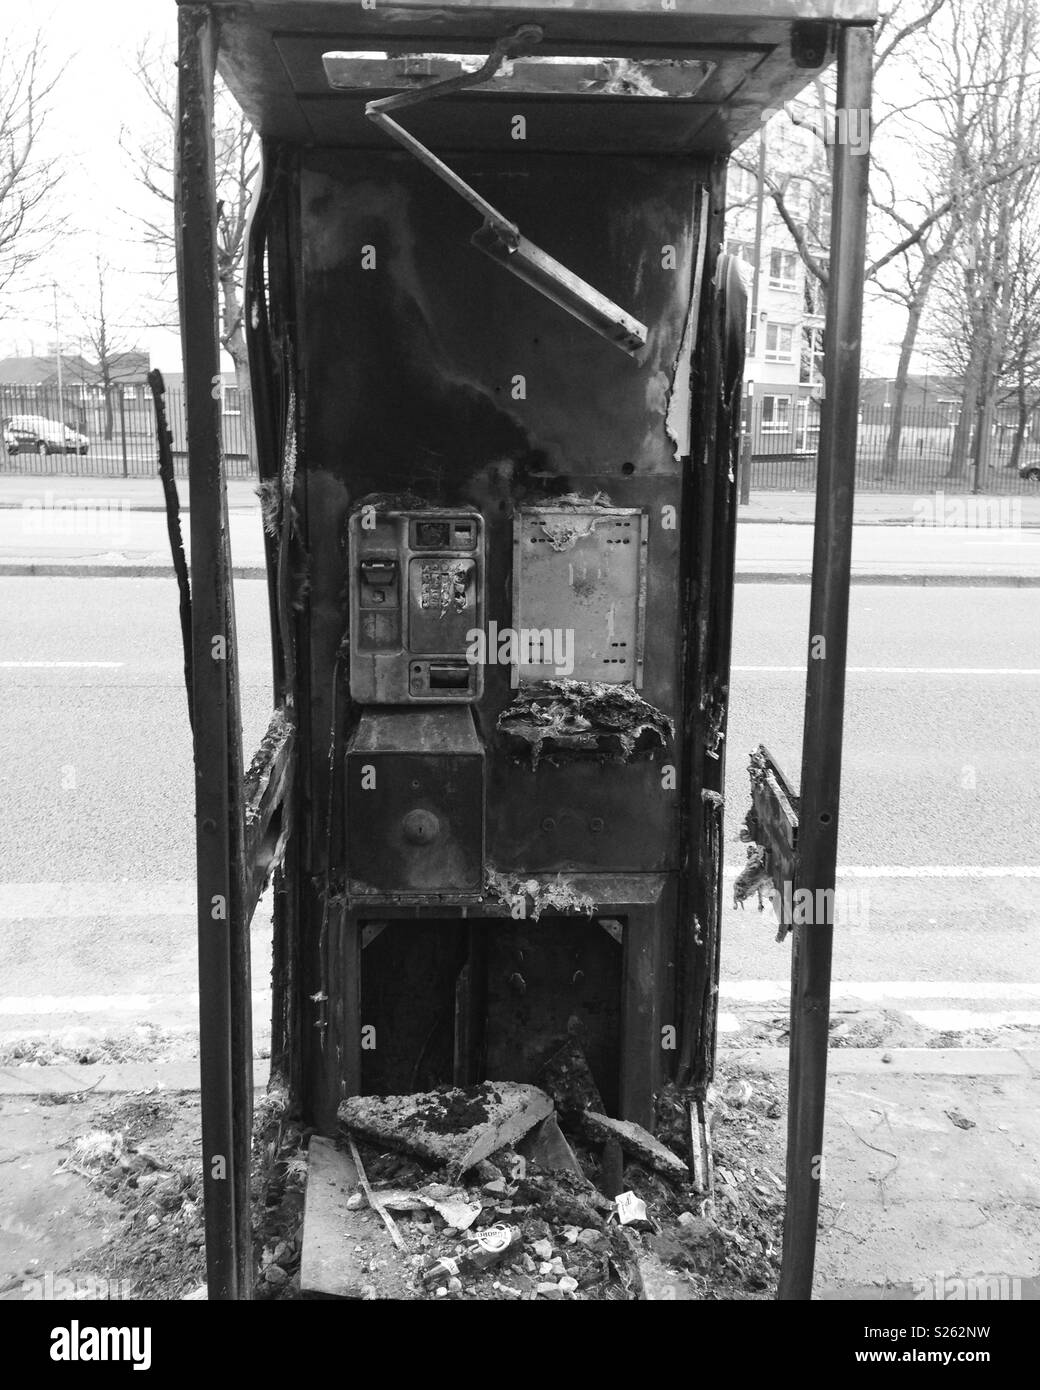 Burned down telephone box - Stock Image